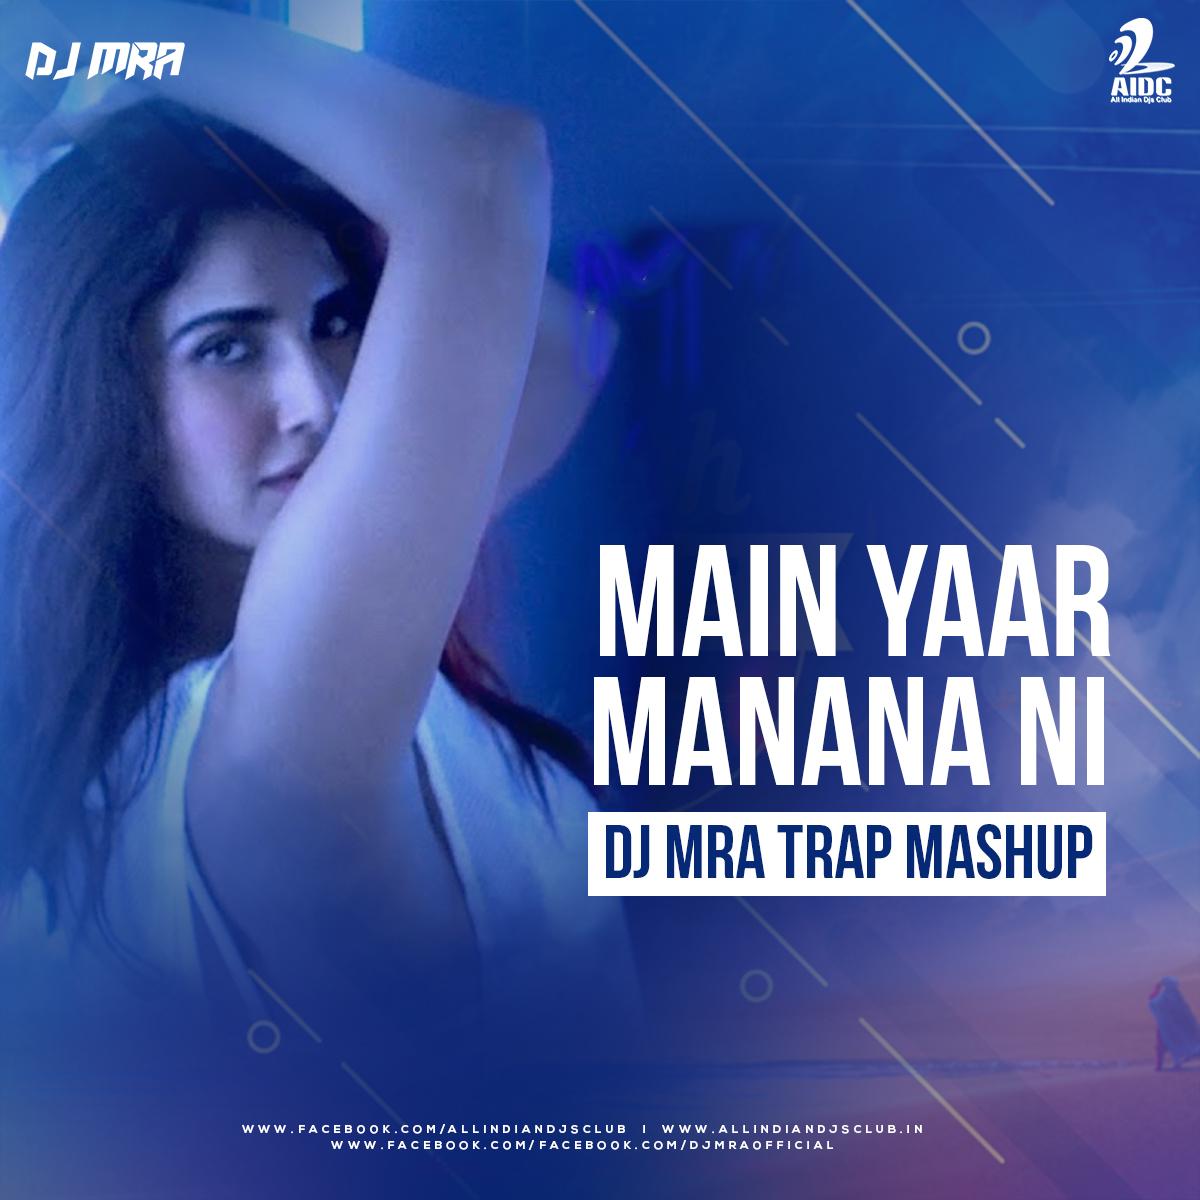 Main Yaar Manana Ni (DJ MRA Trap Mashup)